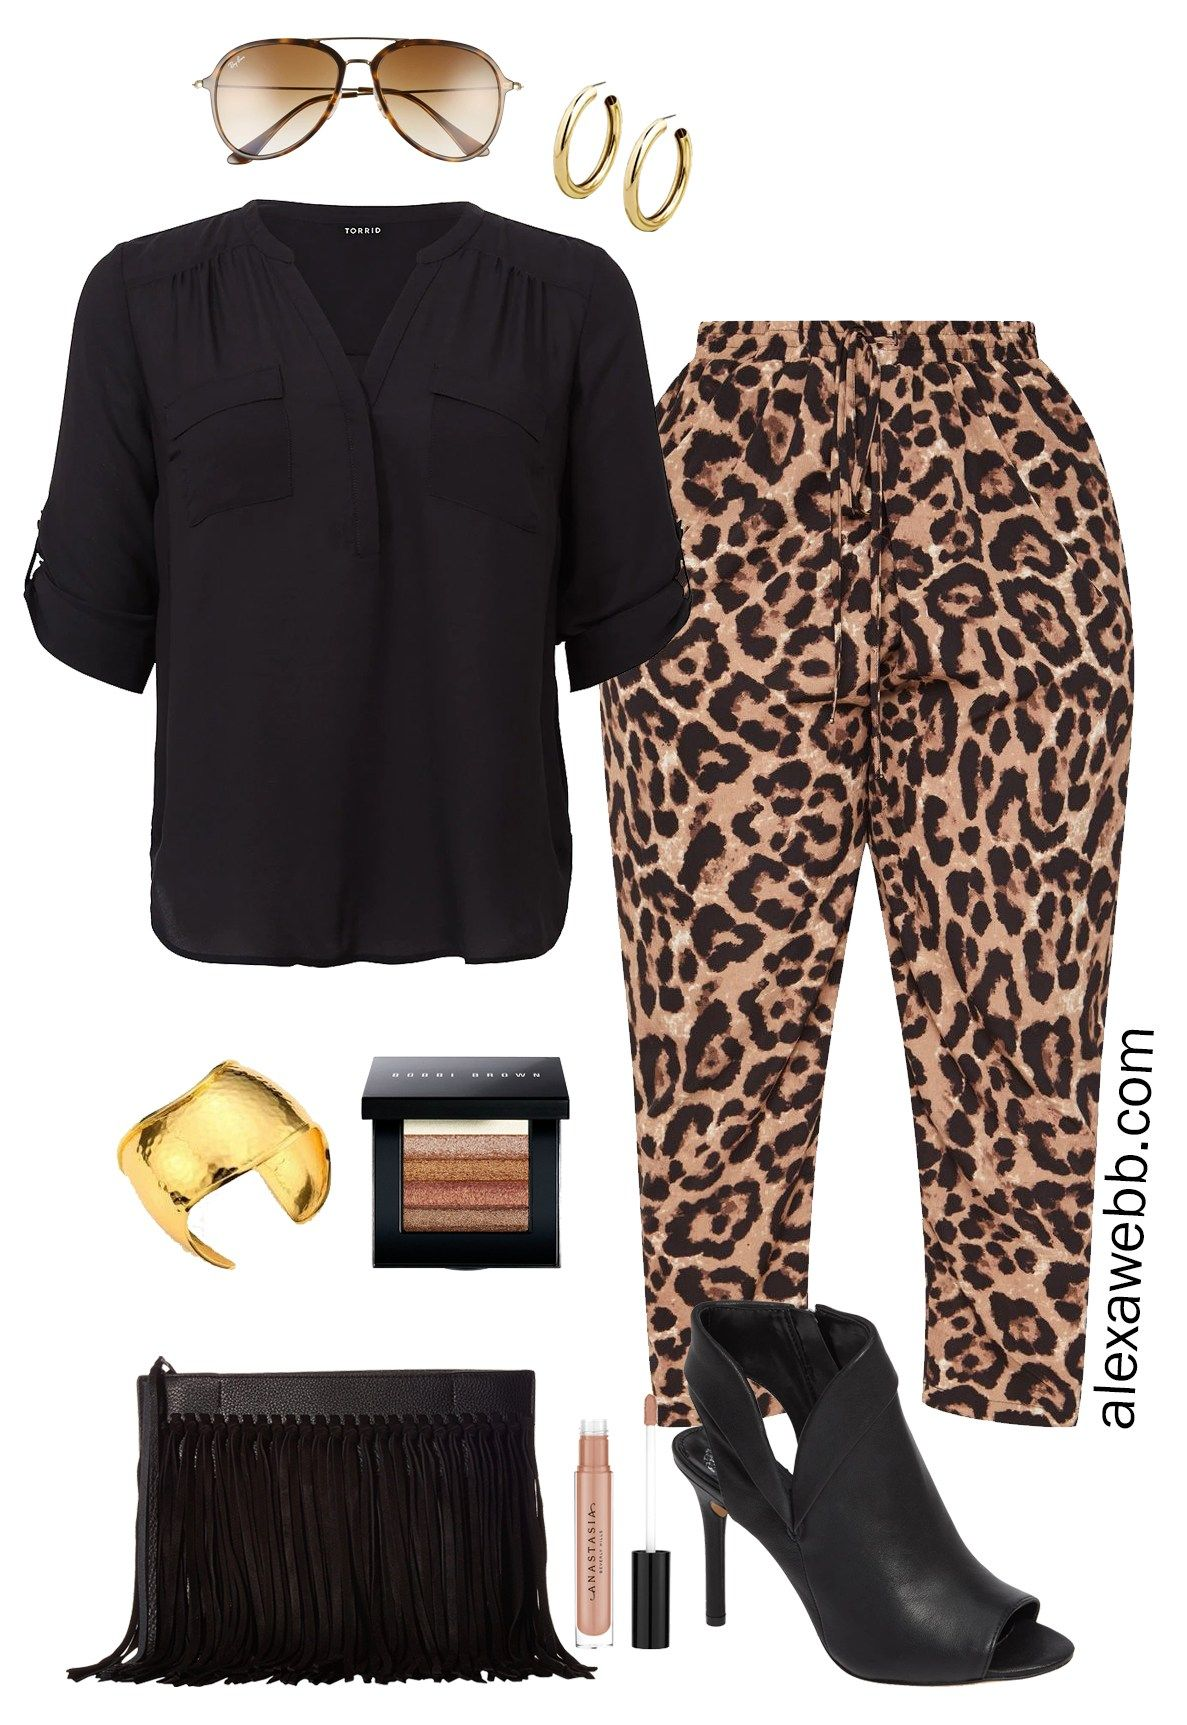 237515bc83bcc Plus Size Leopard Pants Outfit Ideas - Date Night Look - Plus Size Fashion  for Women - alexawebb.com #plussize #alexawebb